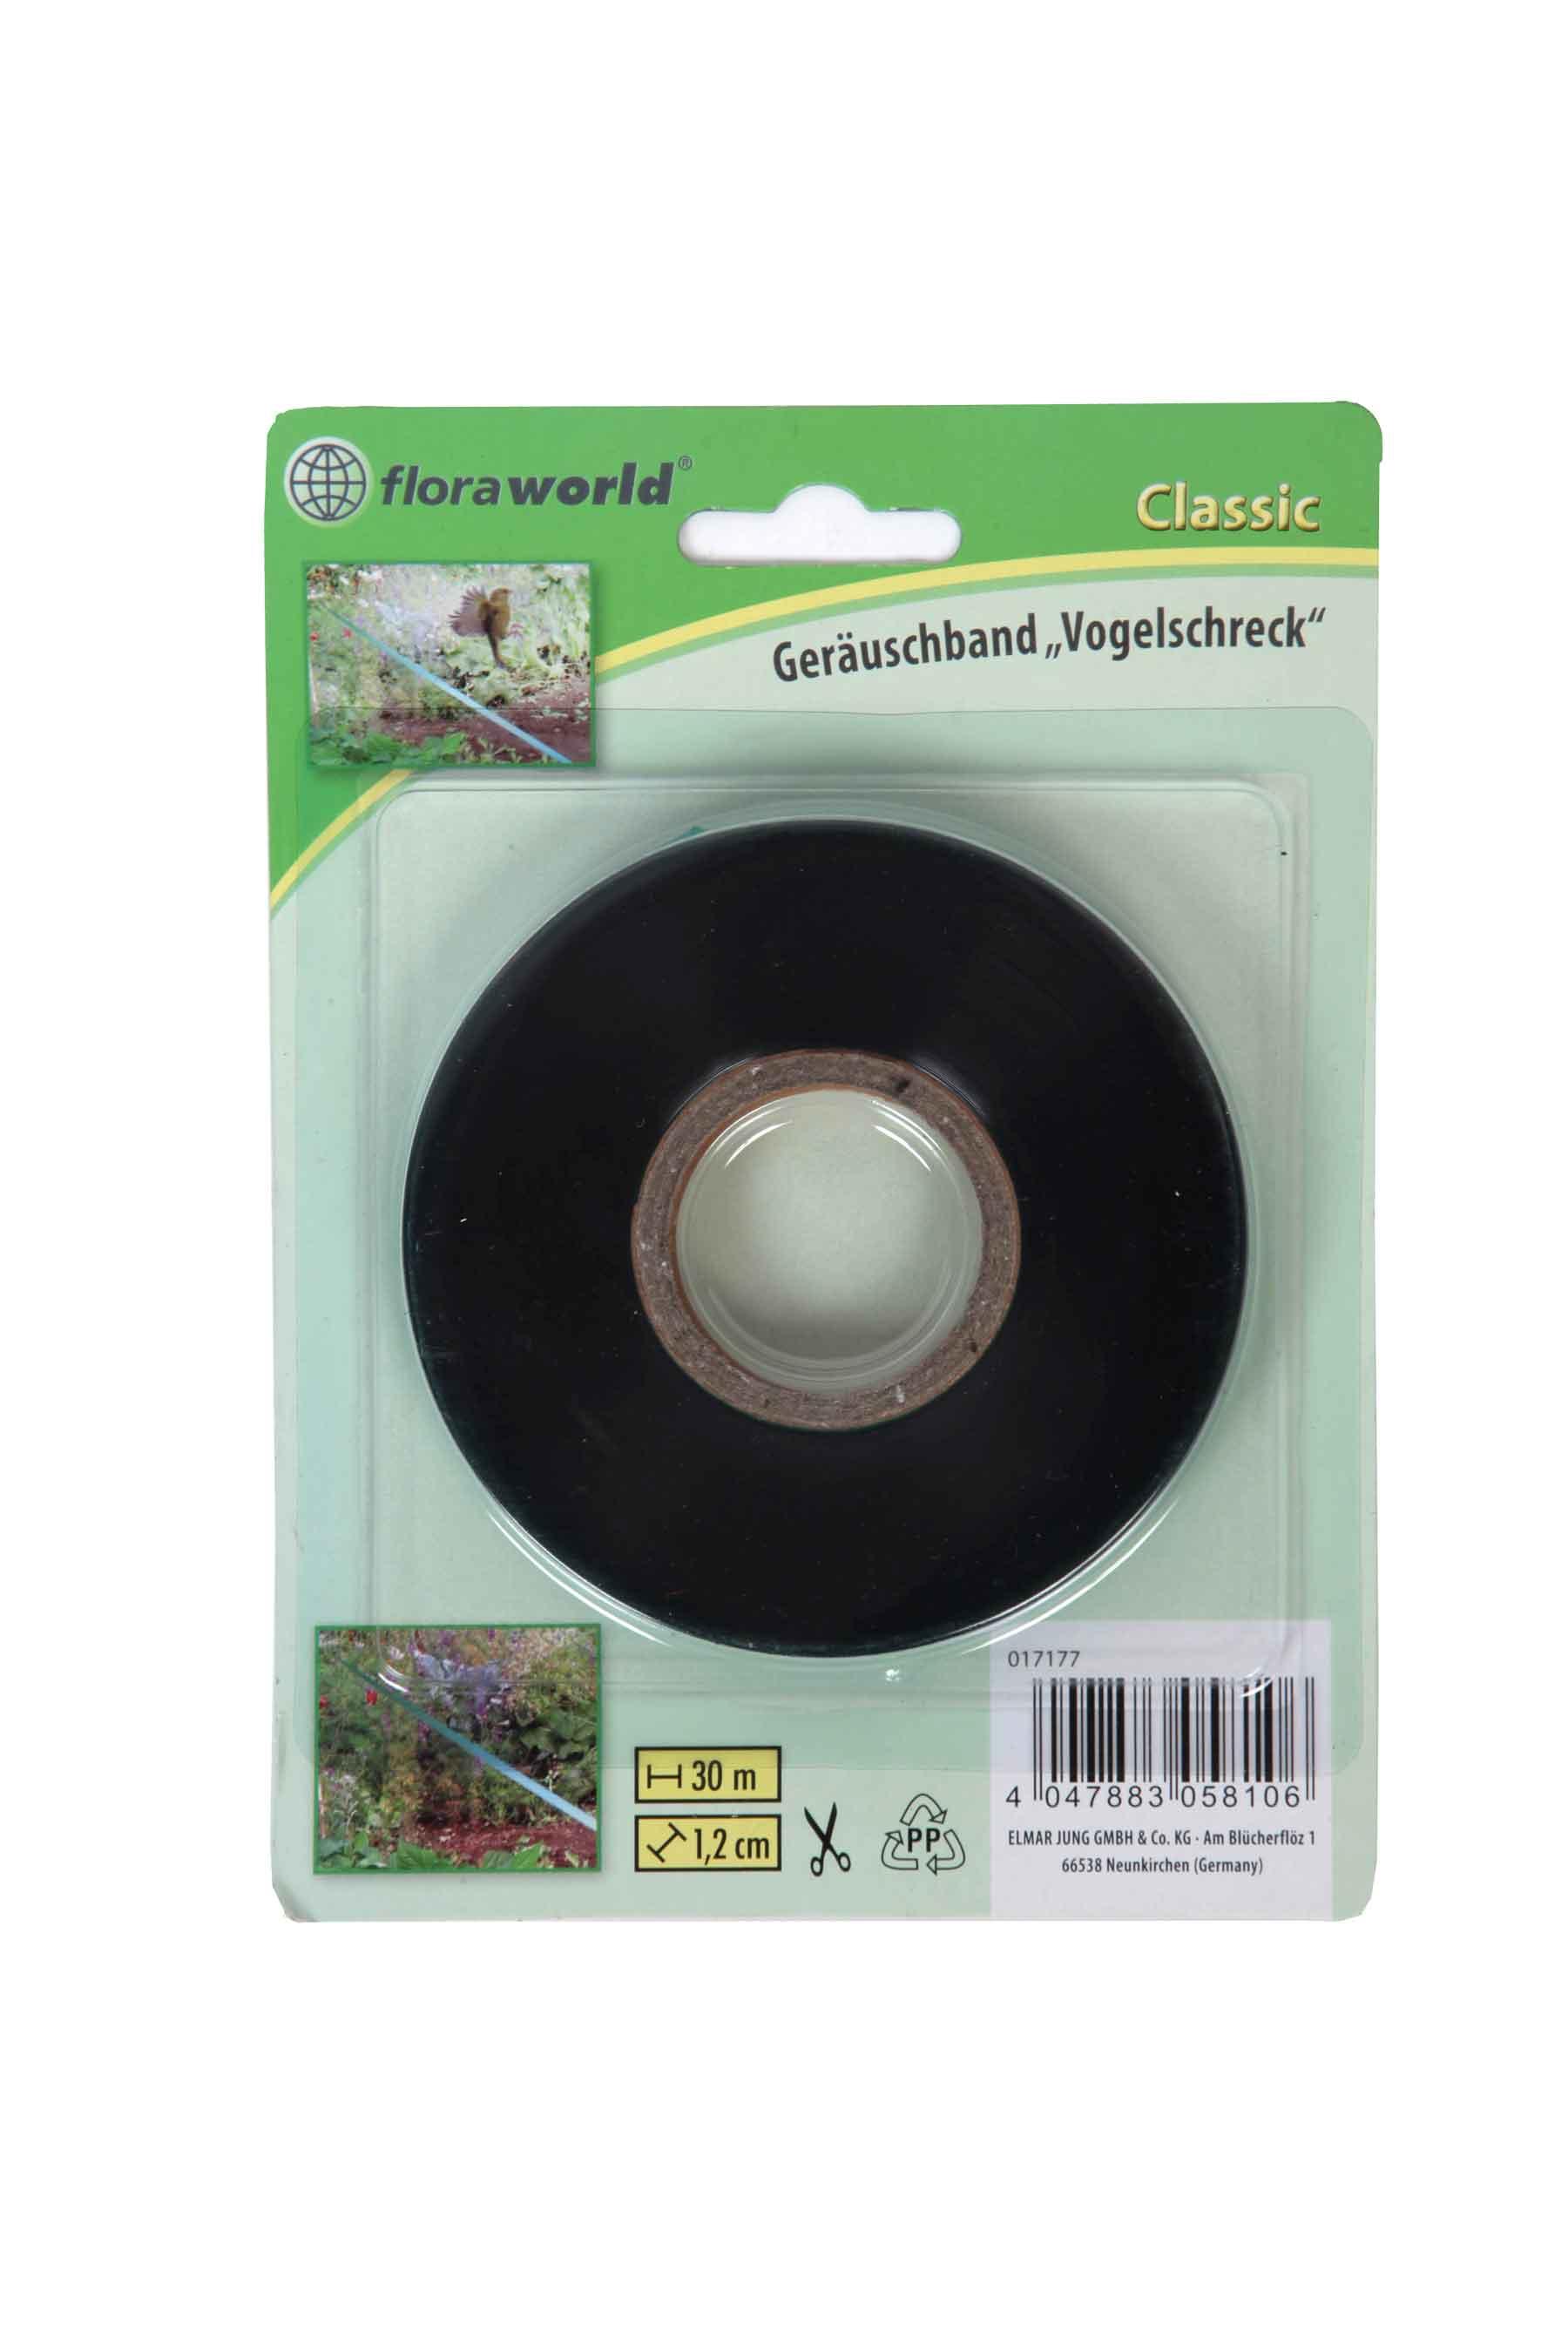 Geräuschband floraworld 30mx1,2cm Bild 1